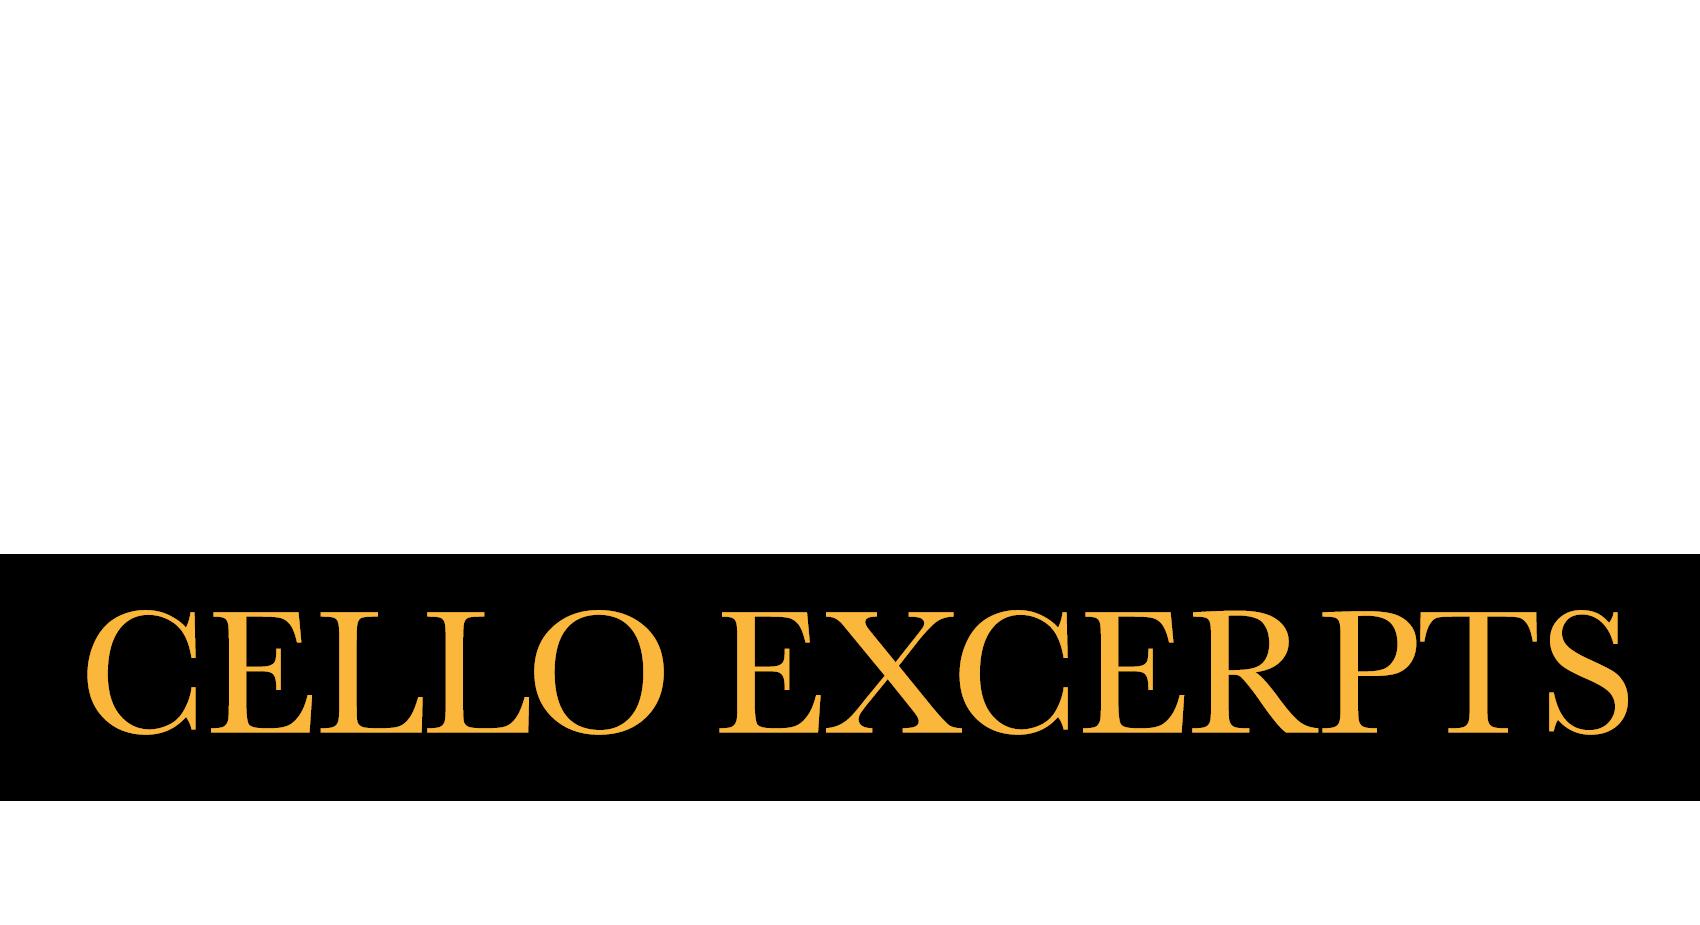 Cello - Orchestra Excerpts